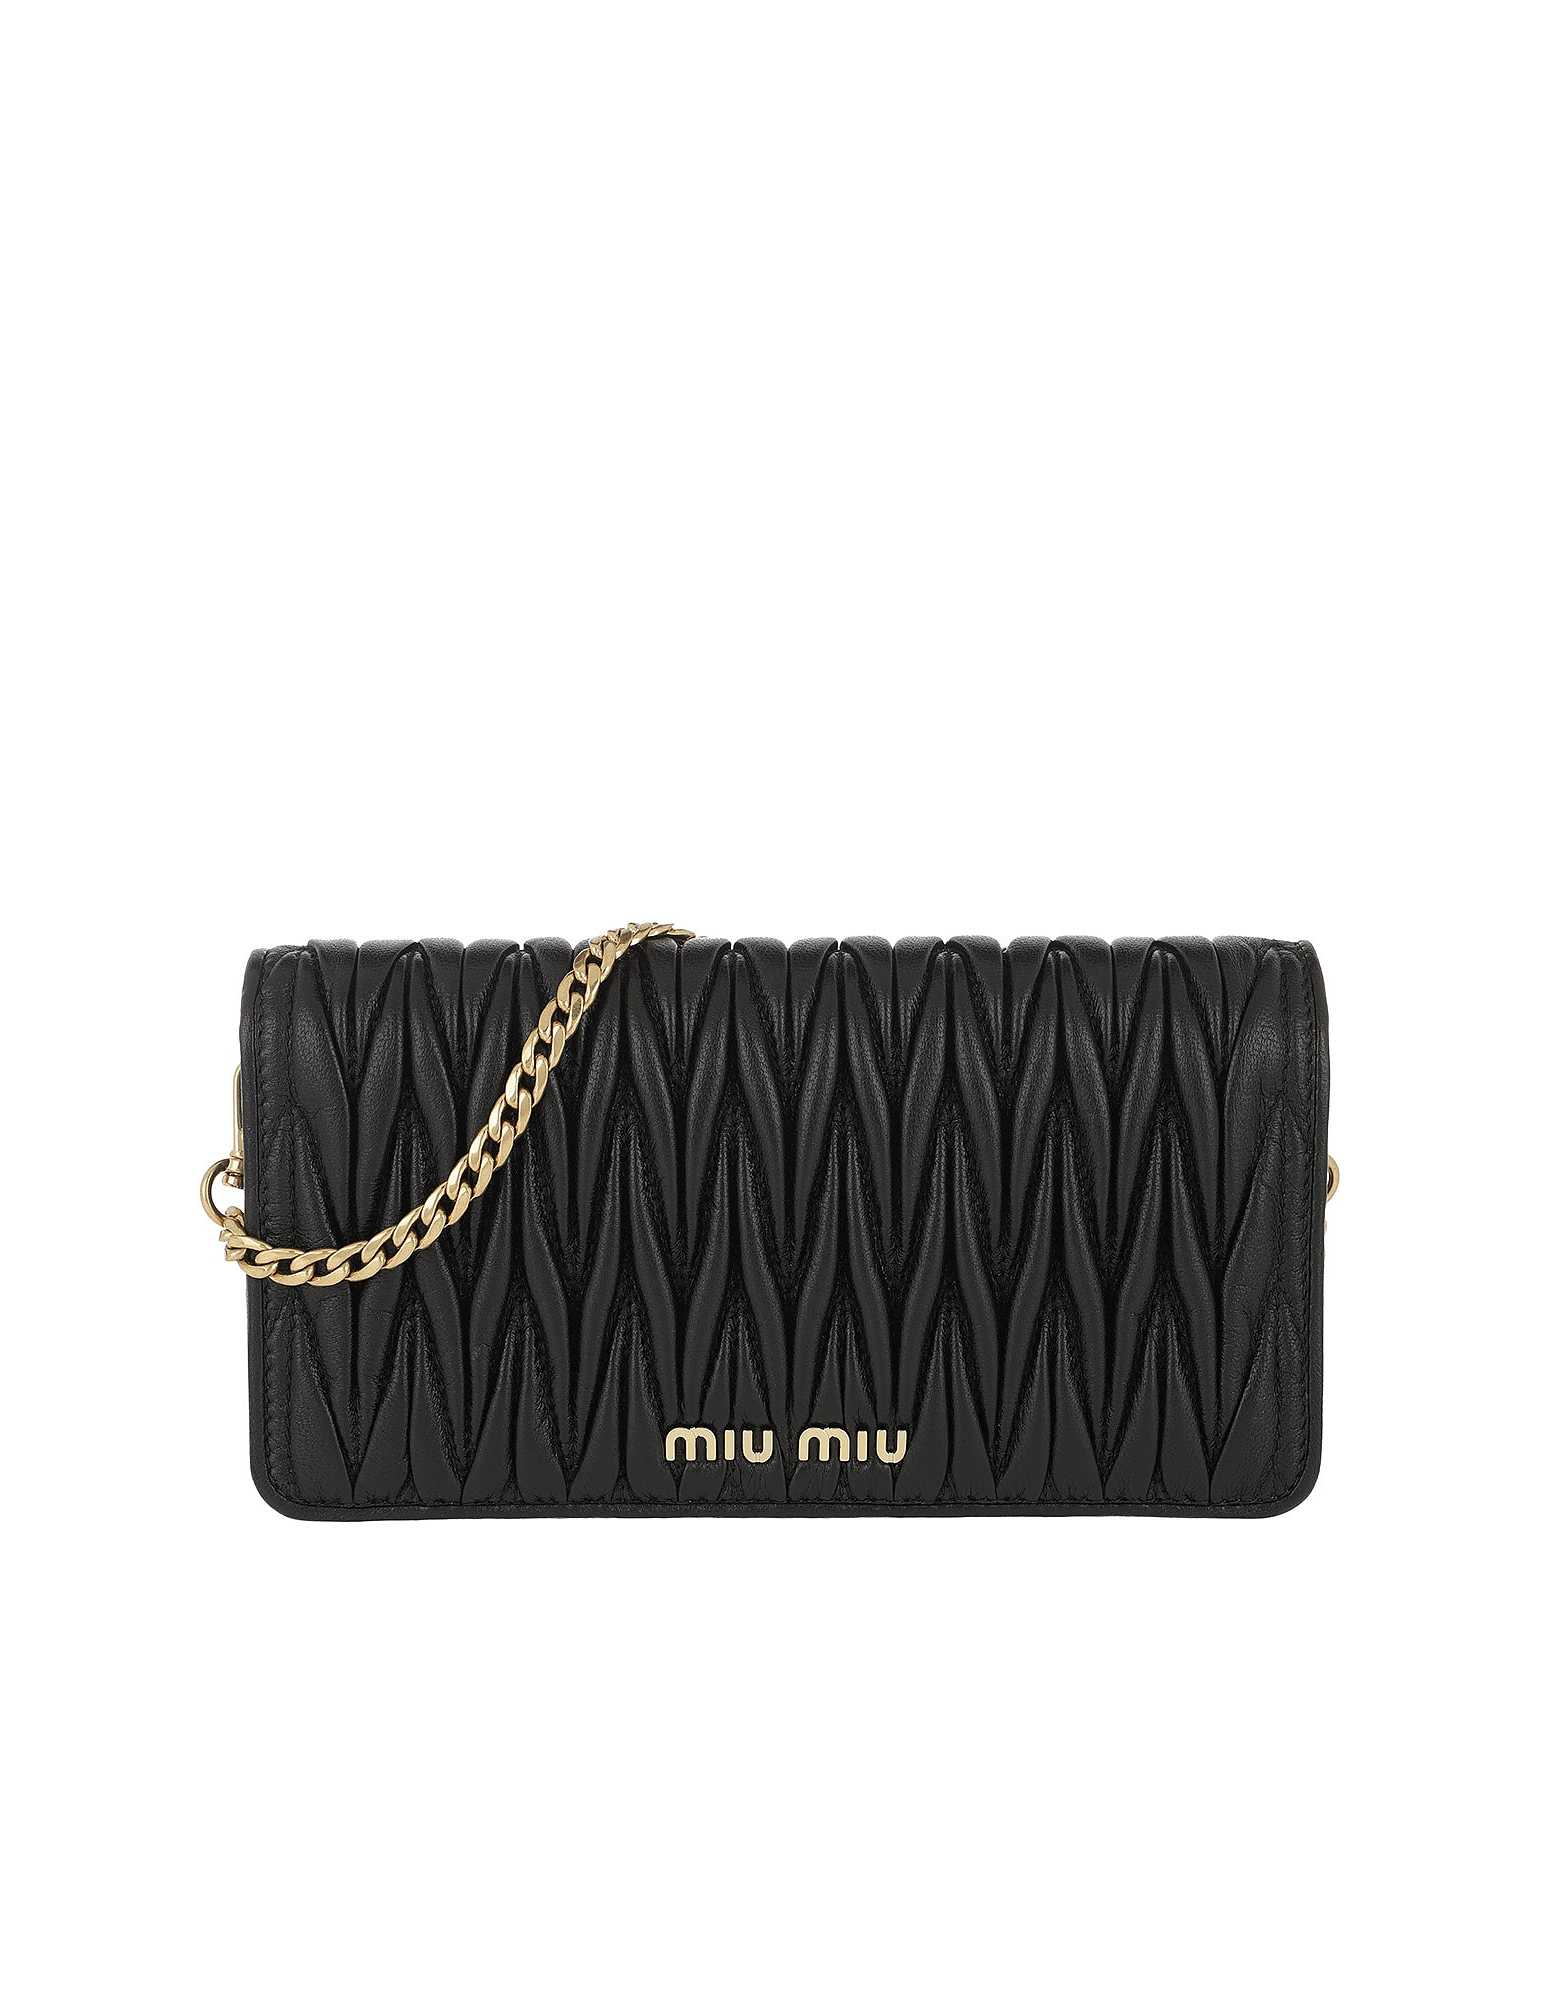 Miu Miu Handbags, Logo Wallet on Chain Black